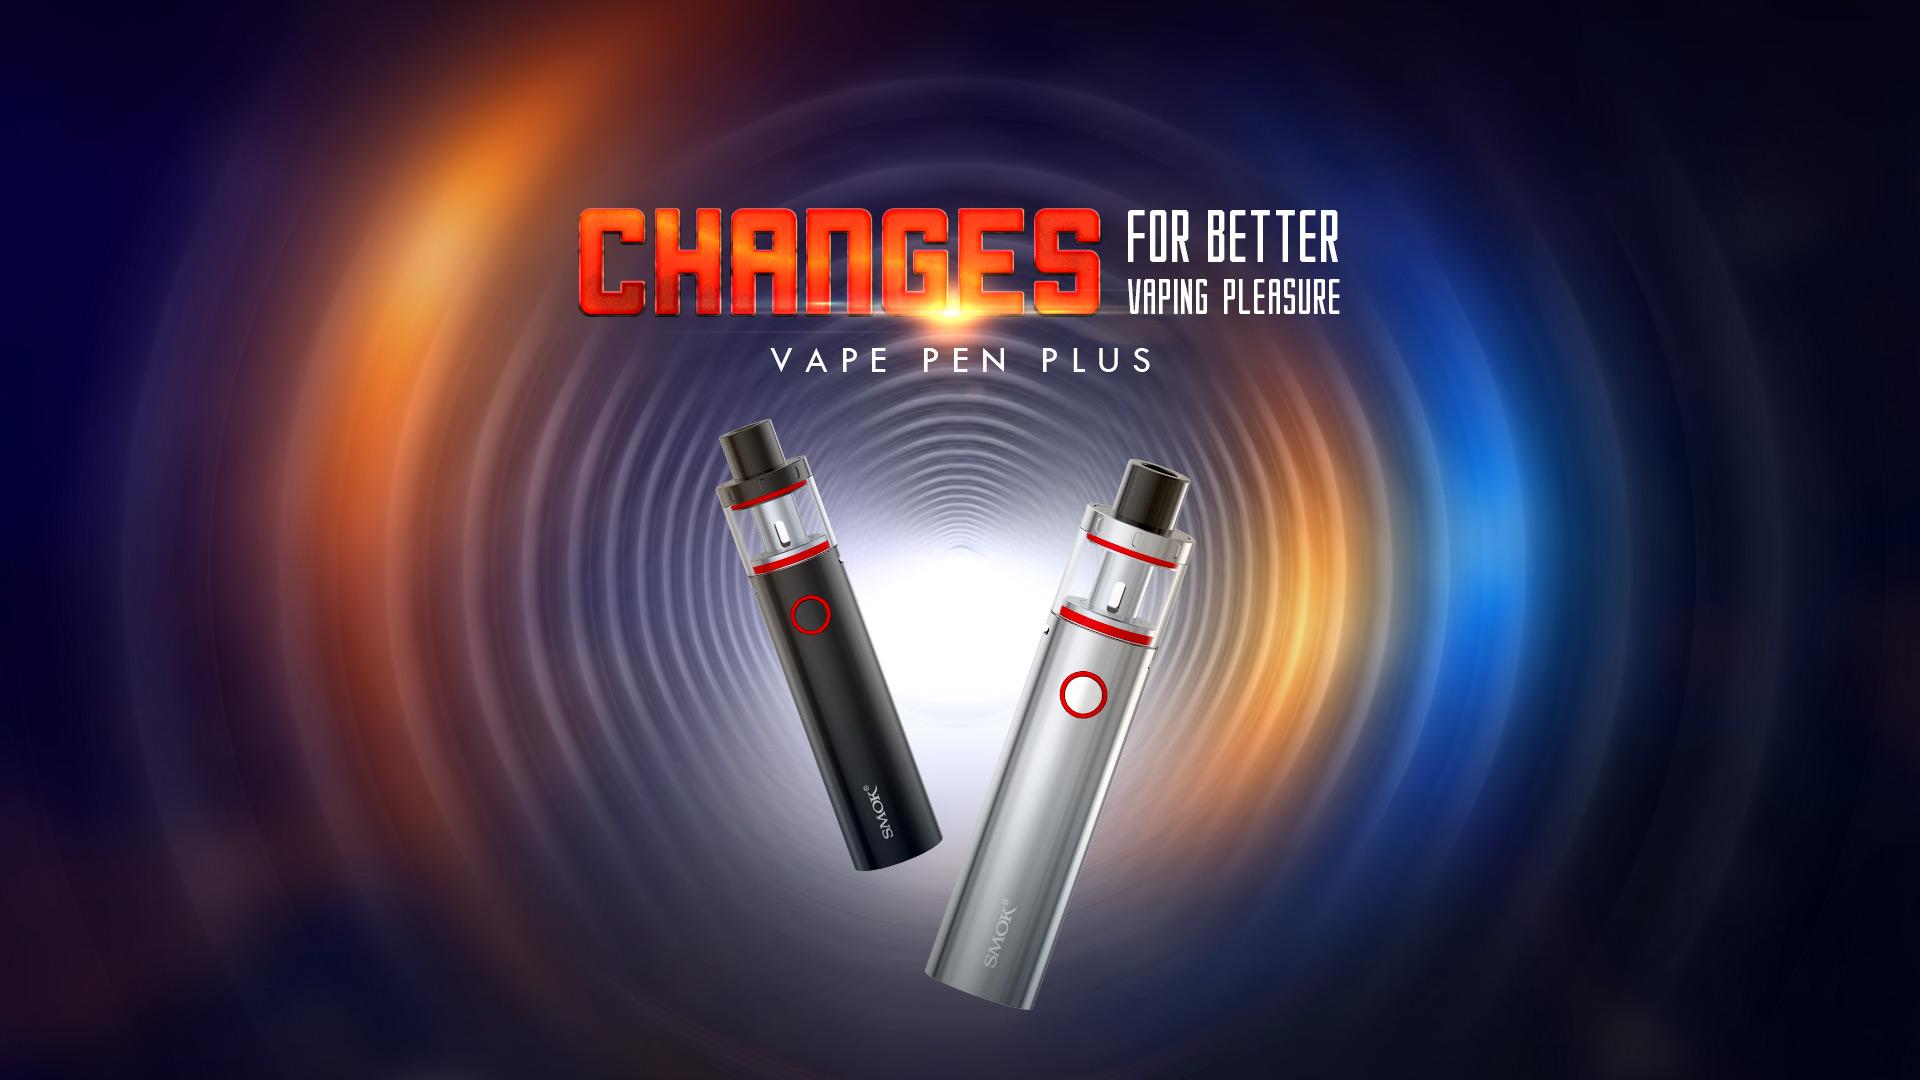 Vape Pen Plus Smok 174 Innovation Keeps Changing The Vaping